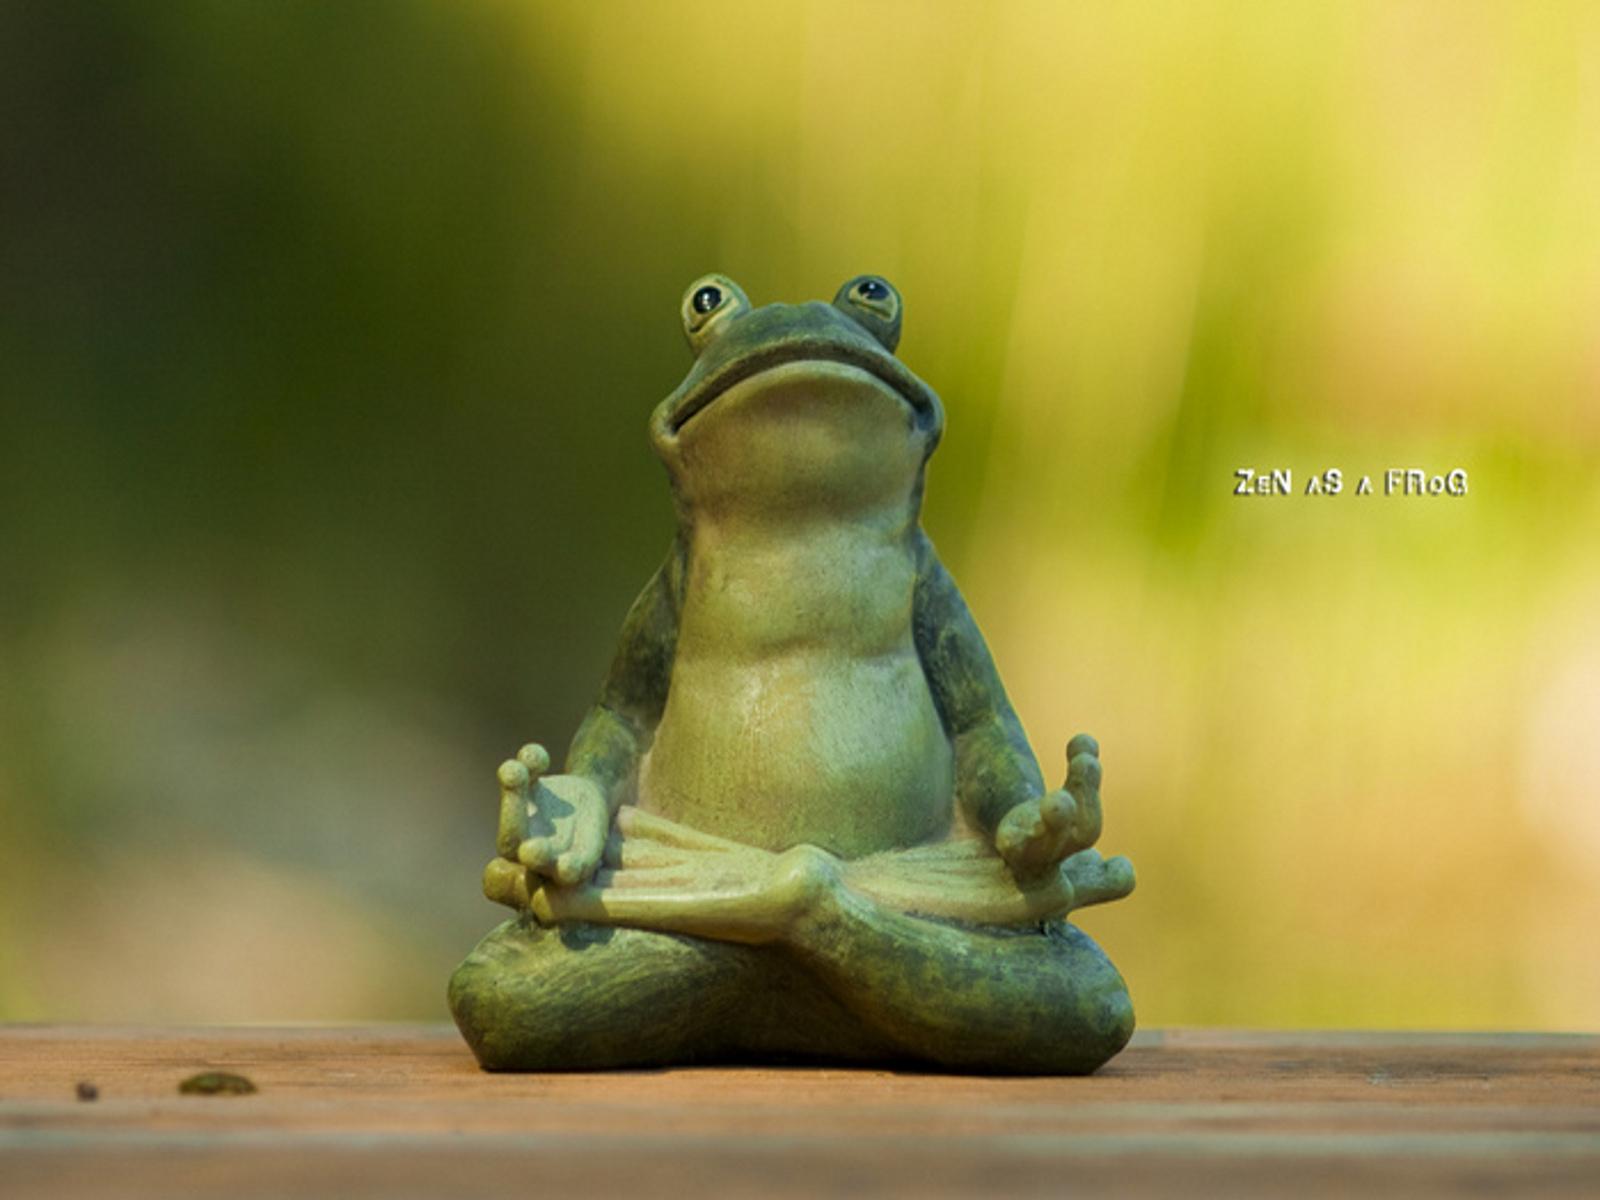 Zen as a frog ;)